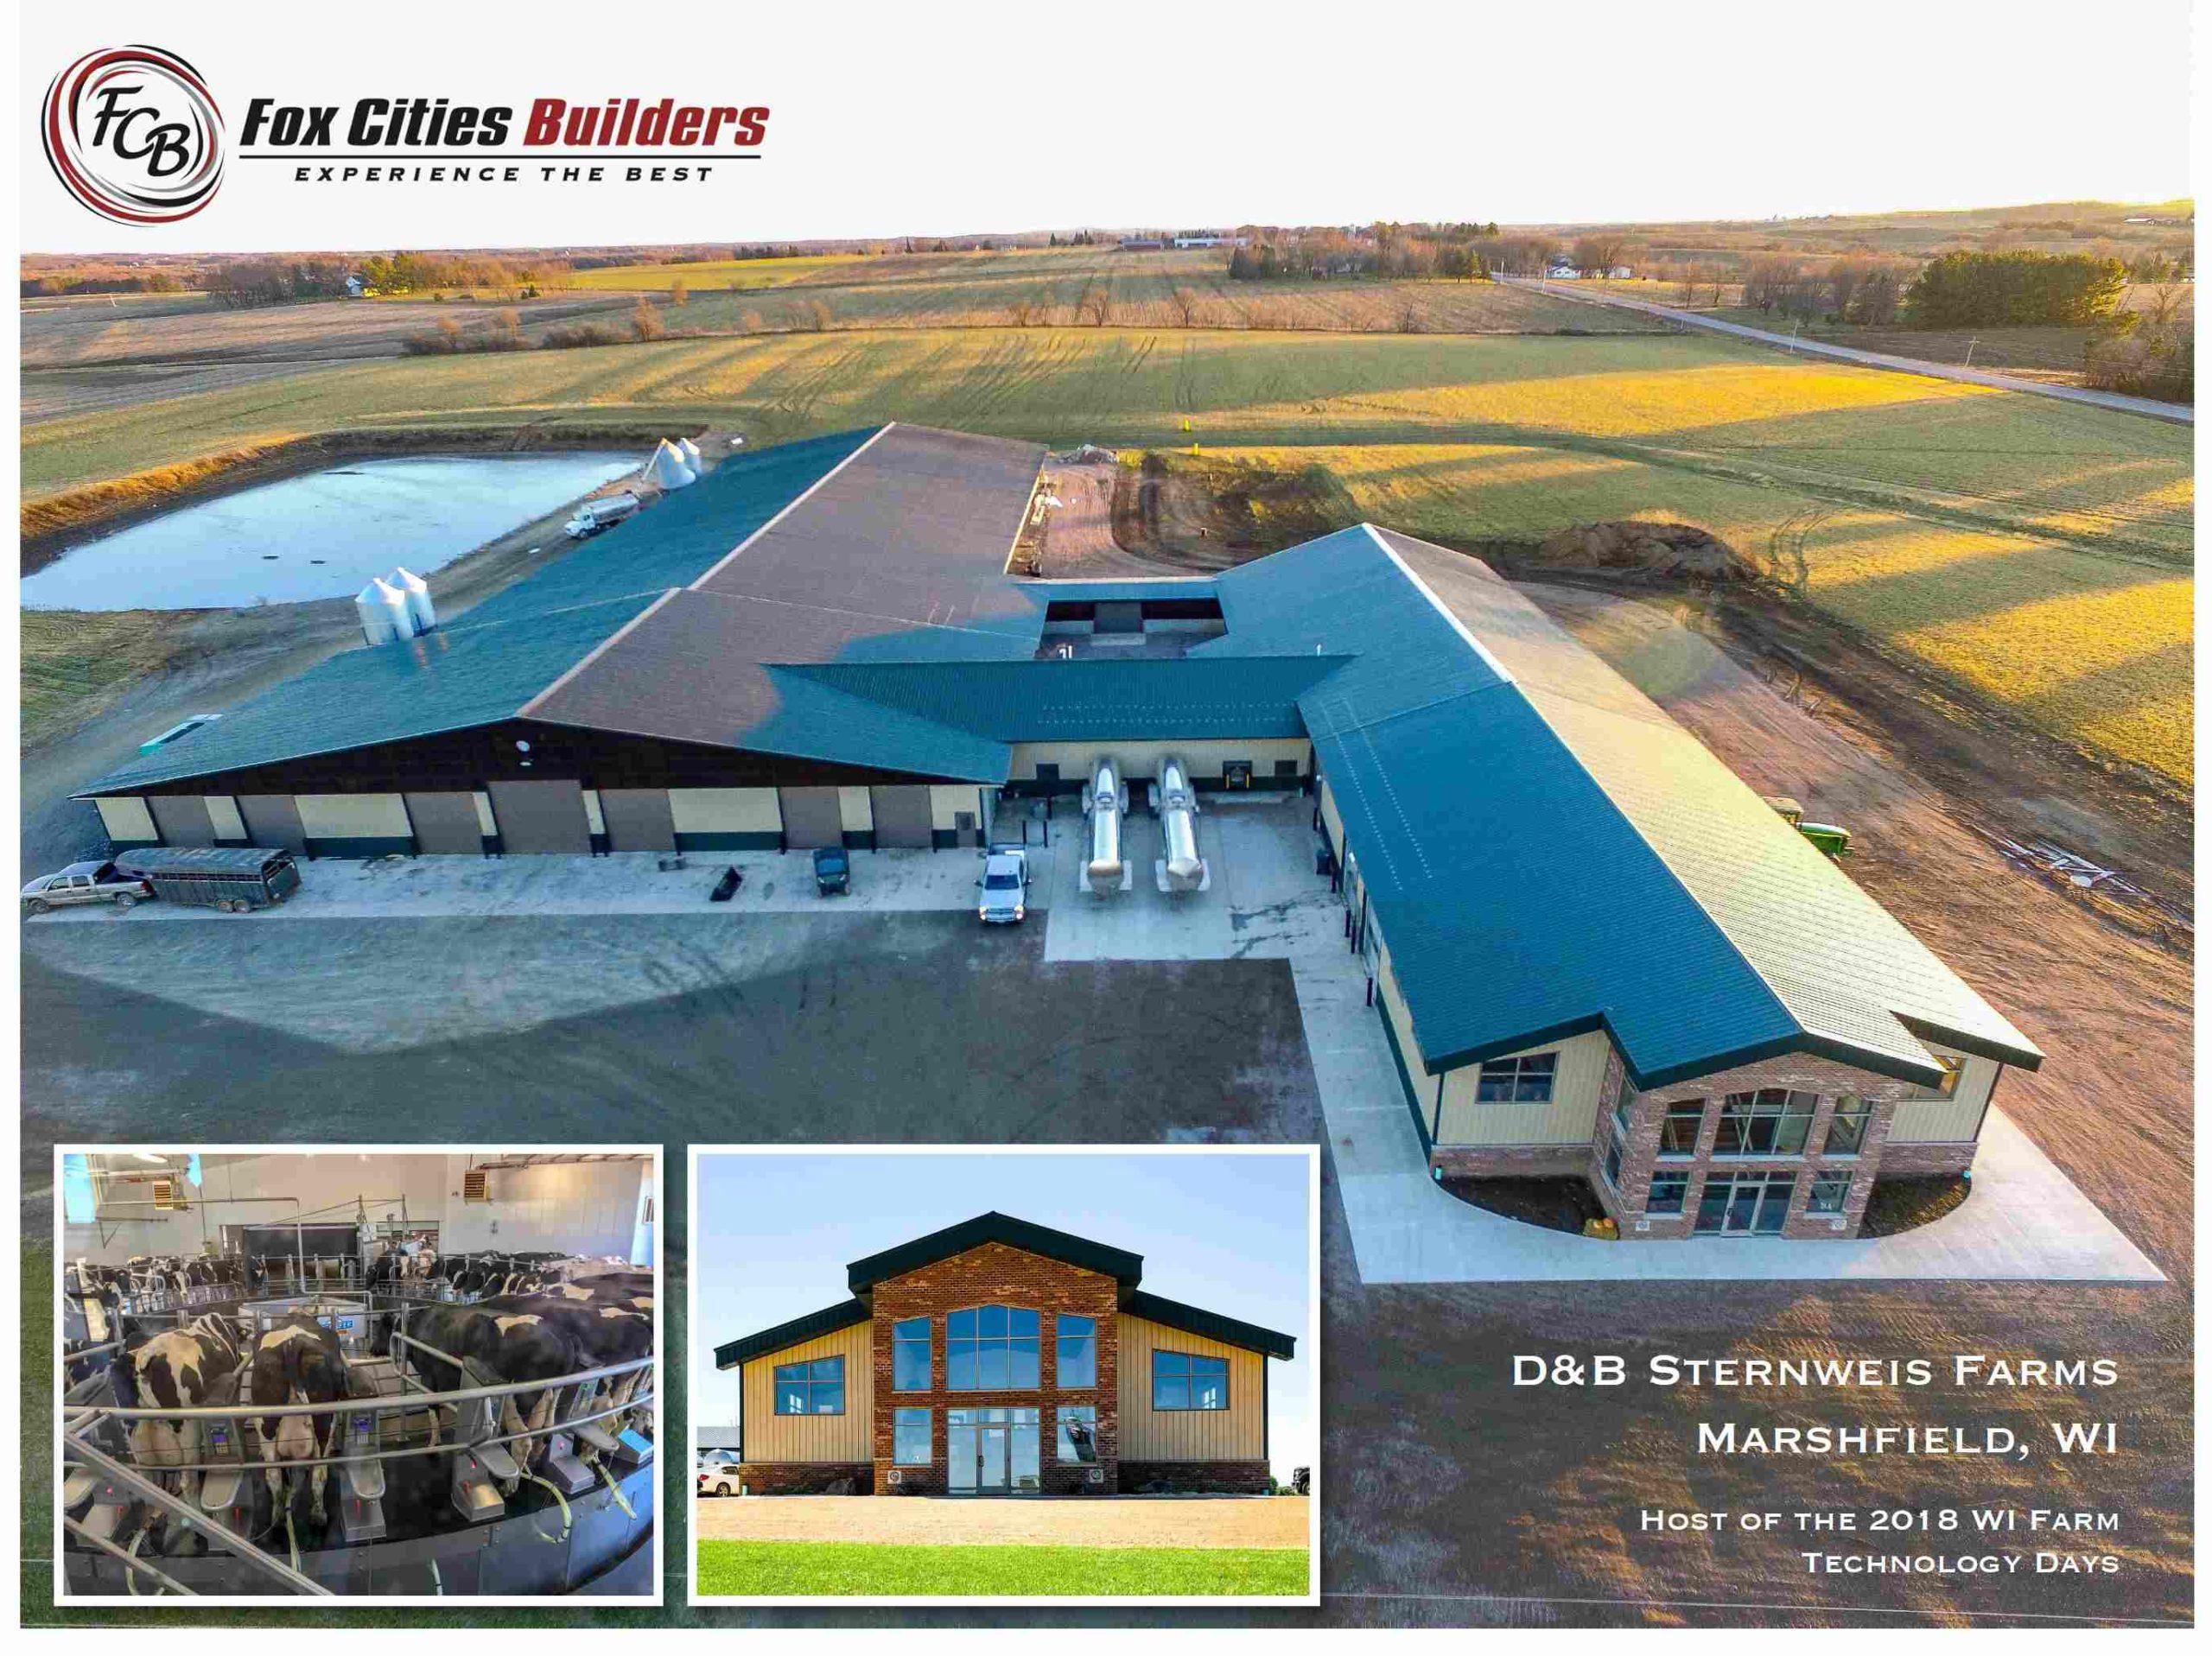 D&B Sternweis Farms, Inc. - Rotary Milking Parlor